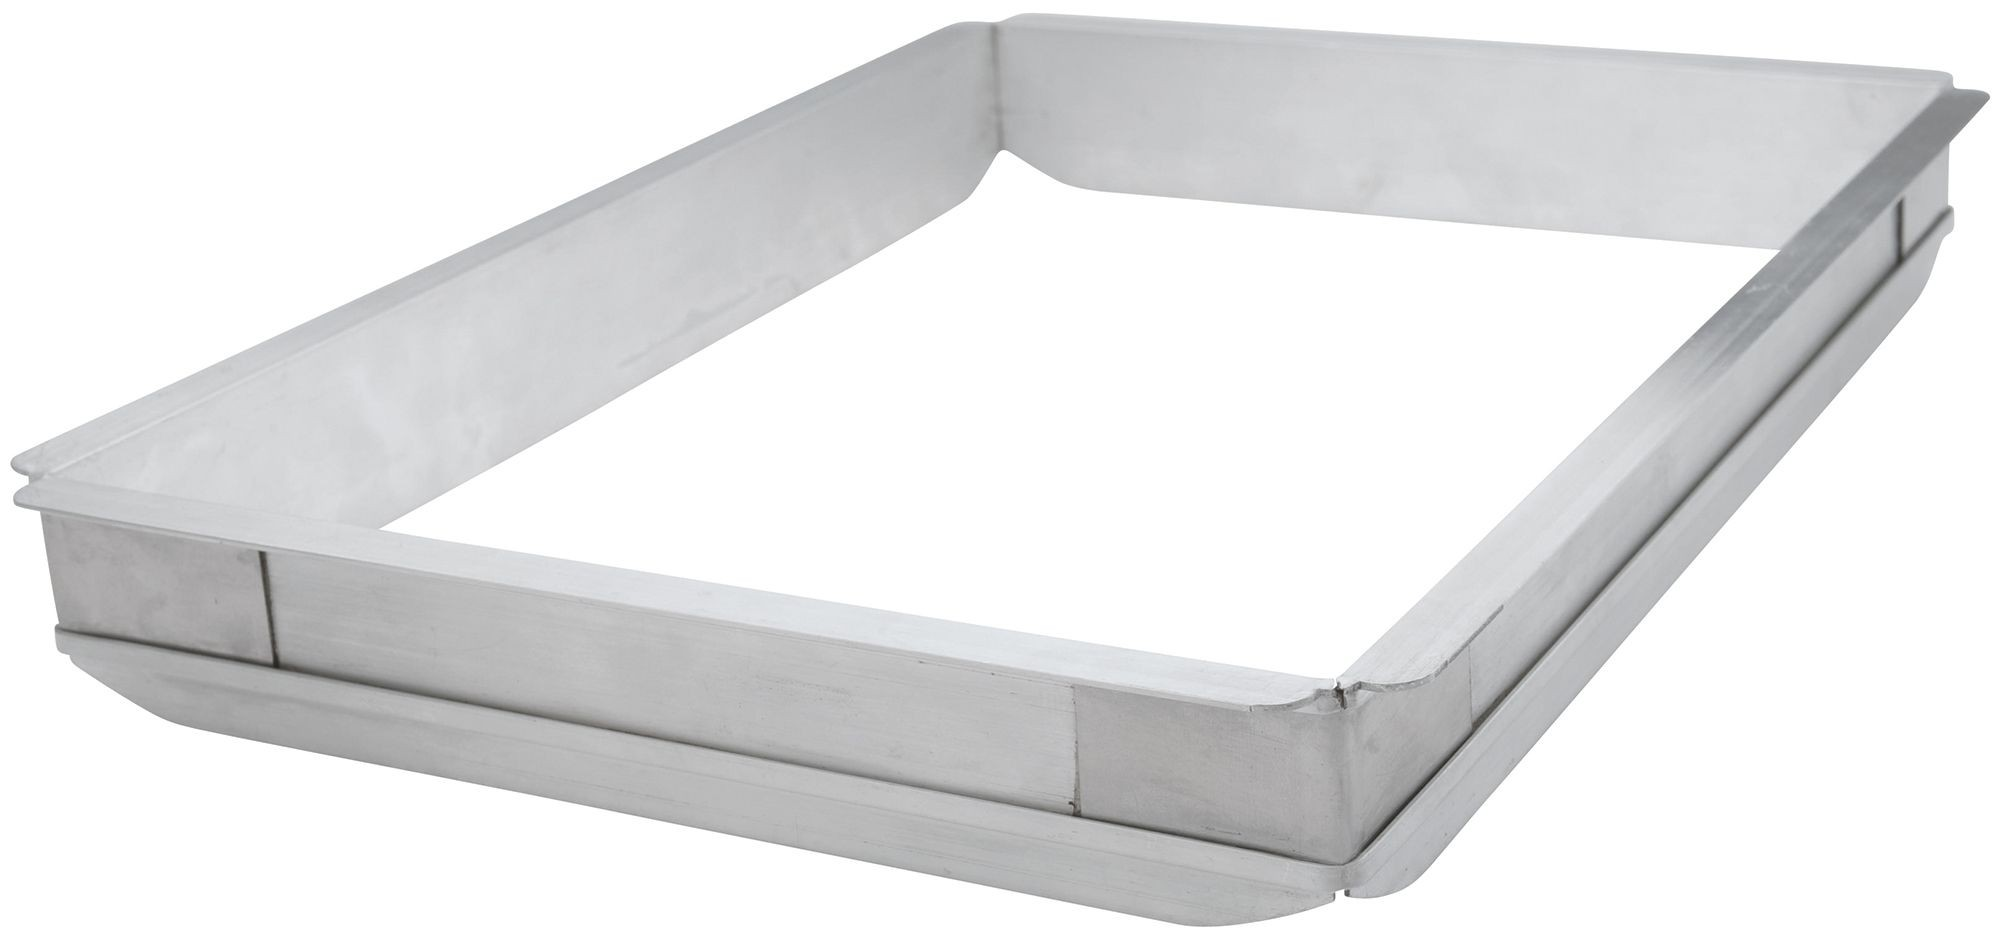 Aluminum Sheet Pan Extender (Full-Size)